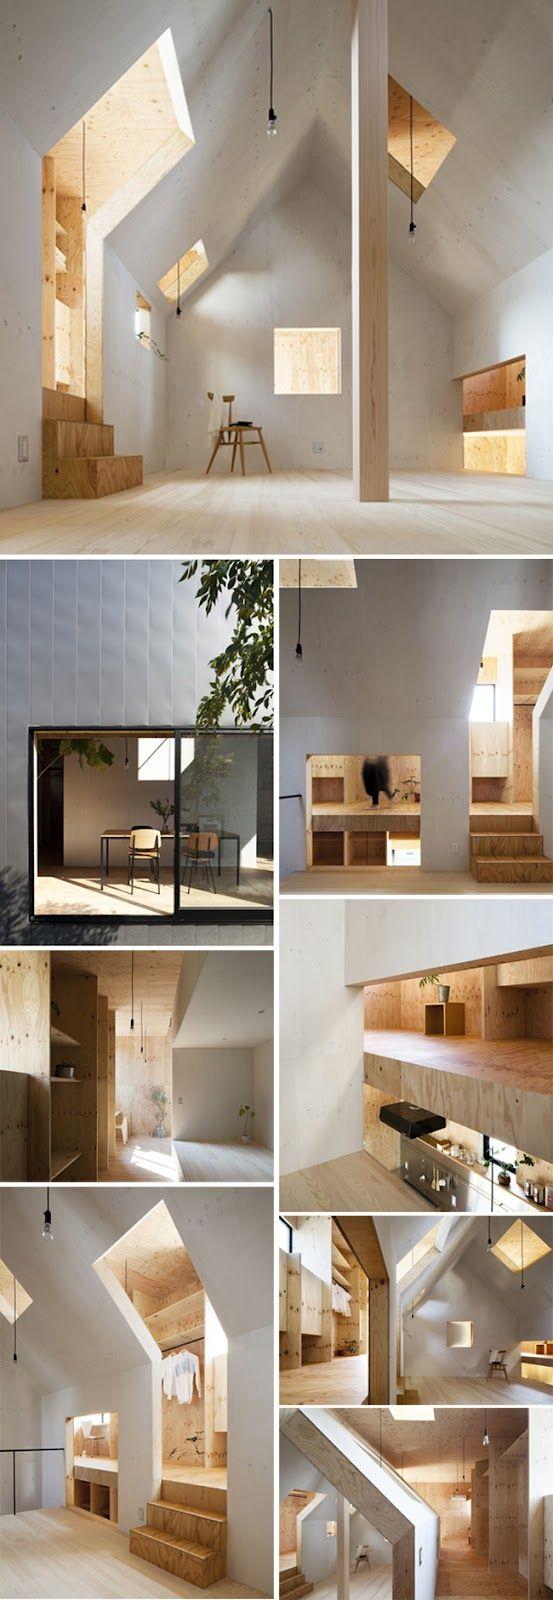 sin pecado concebida: Home, House, Mastyl Architects